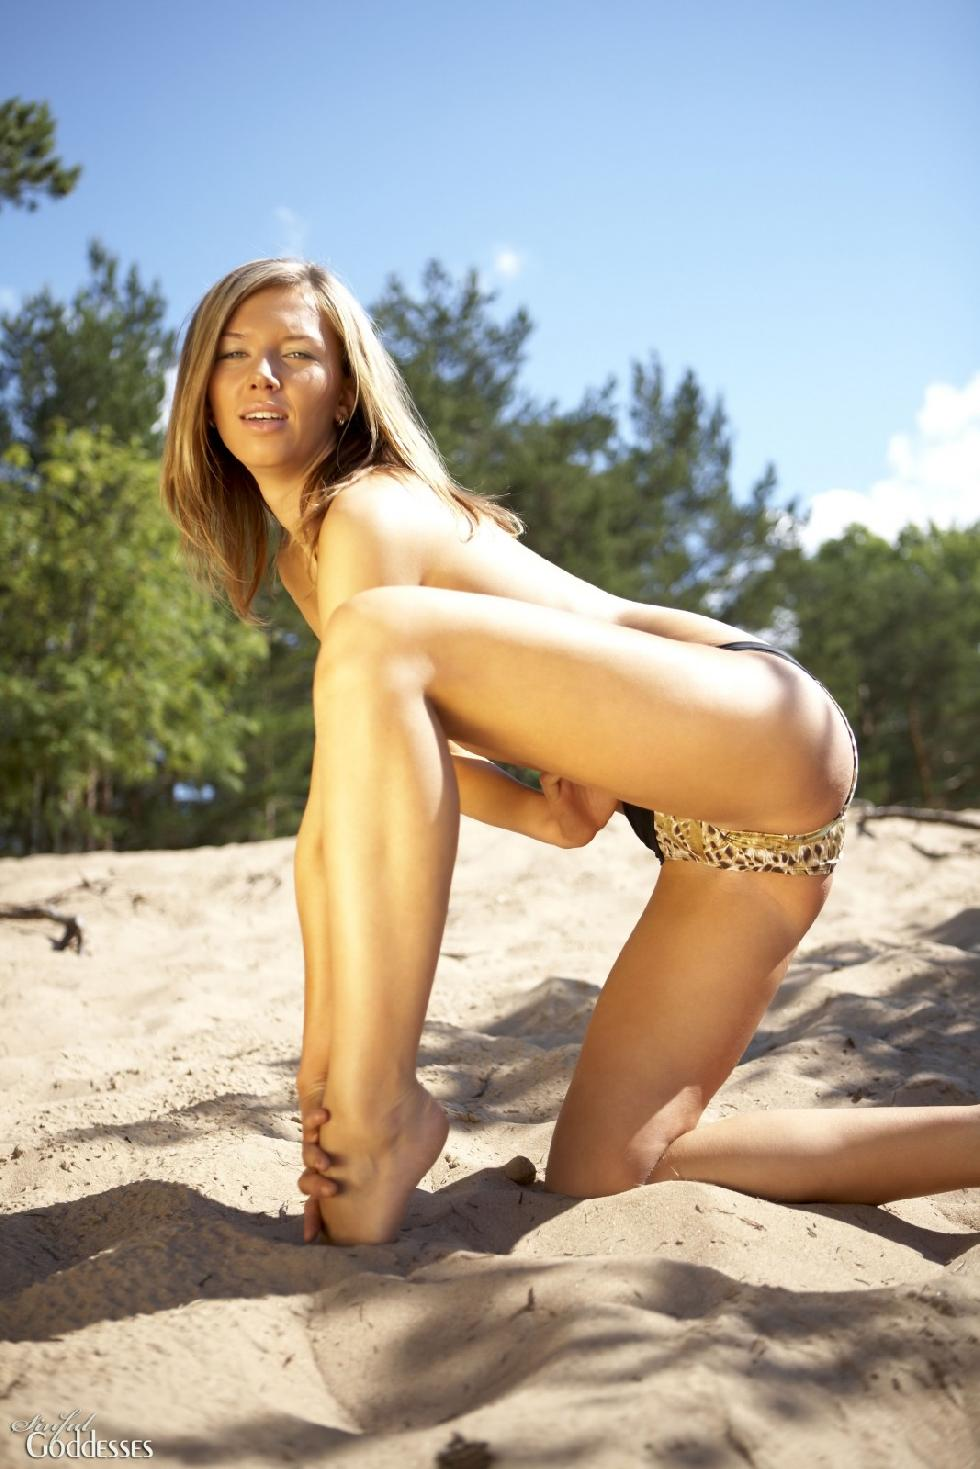 Wild Gema is posing on the beach. Part 1